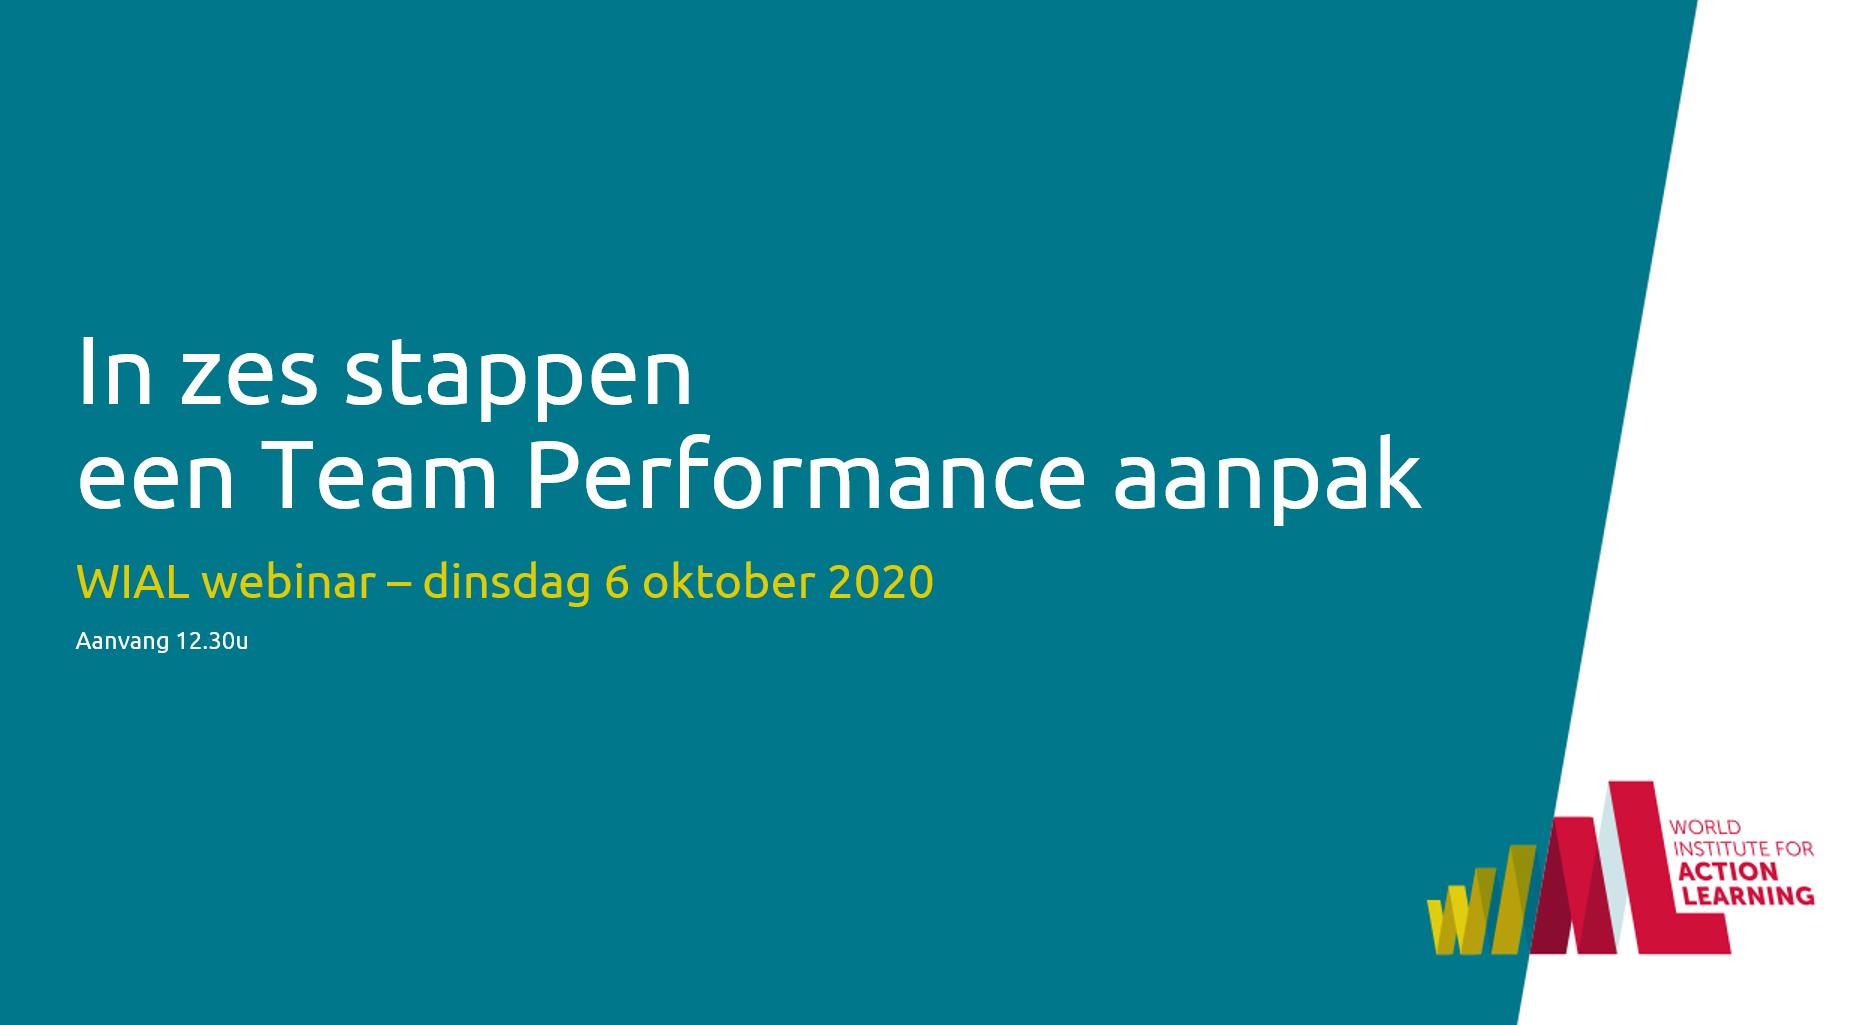 webinar - in zes stappen team performance aanpak - 6 oktober 2020